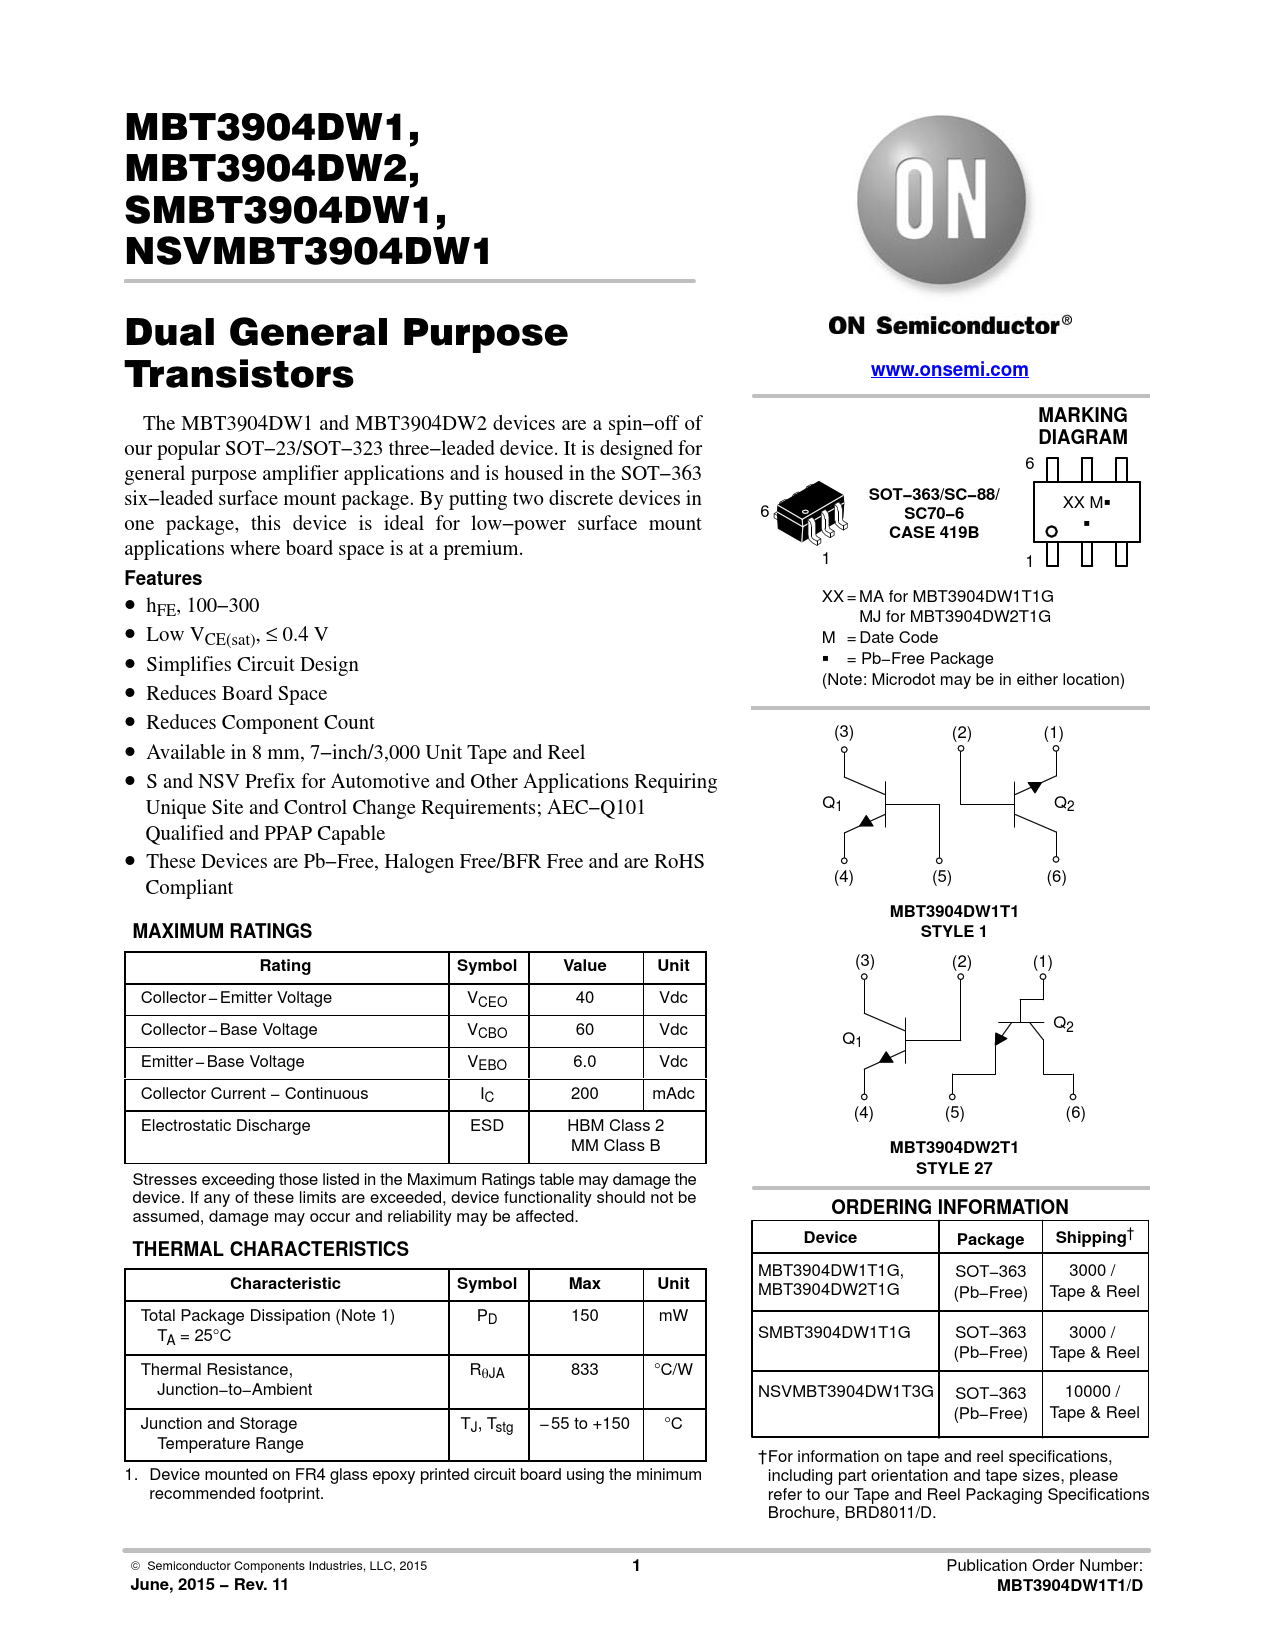 Datasheet MBT3904DW1, MBT3904DW2, SMBT3904DW1, NSVMBT3904DW1 ON Semiconductor, Версия: 11